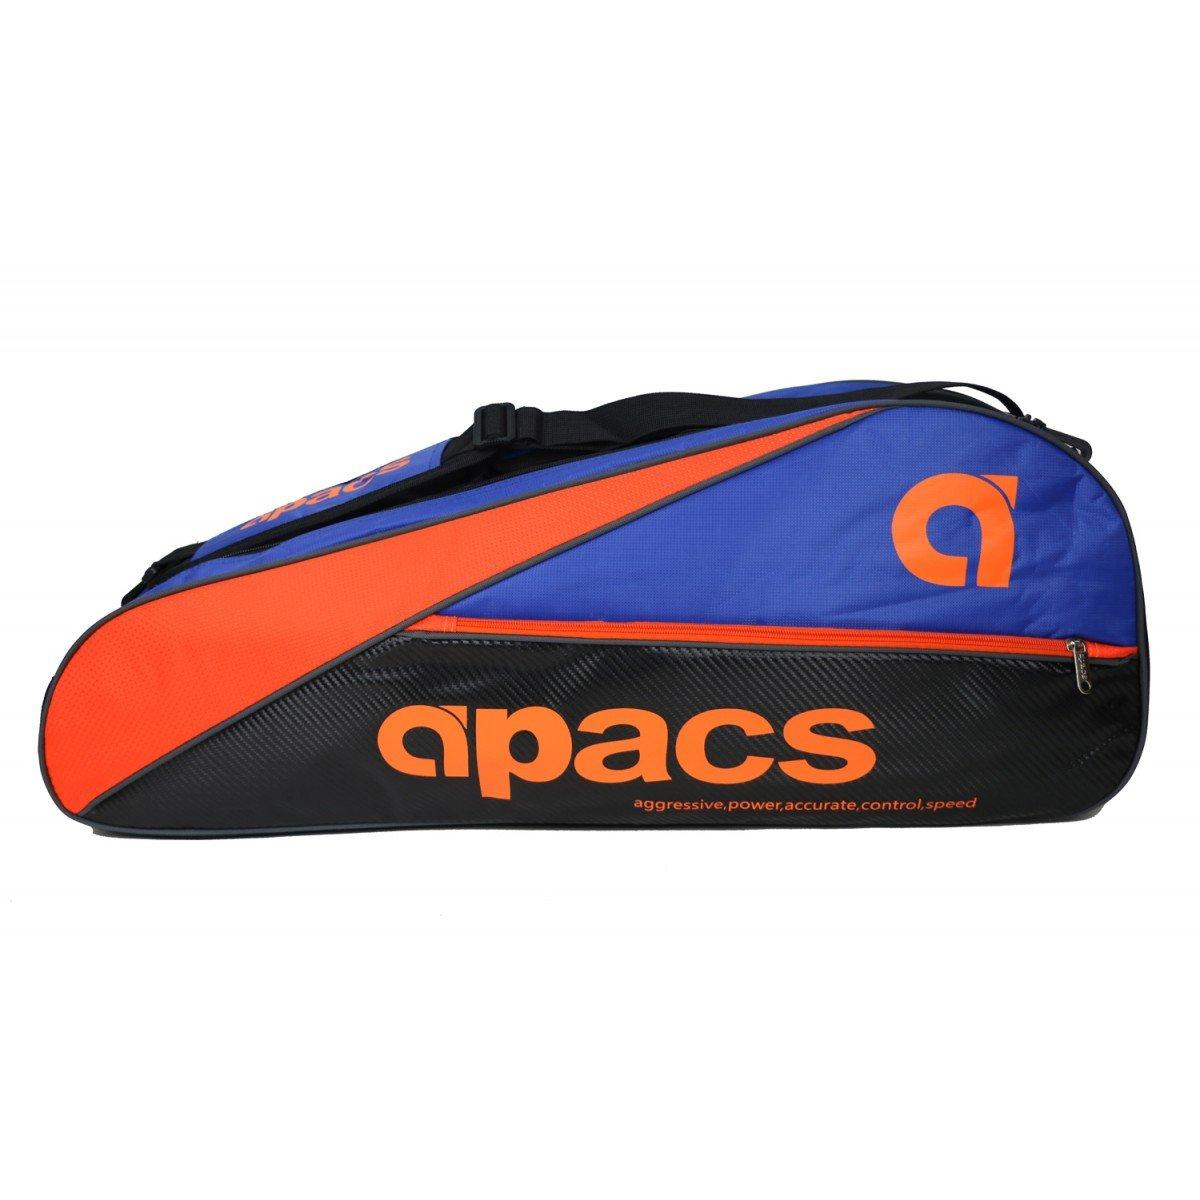 Apacs Double Compartment Racket Badminton Bag AP607